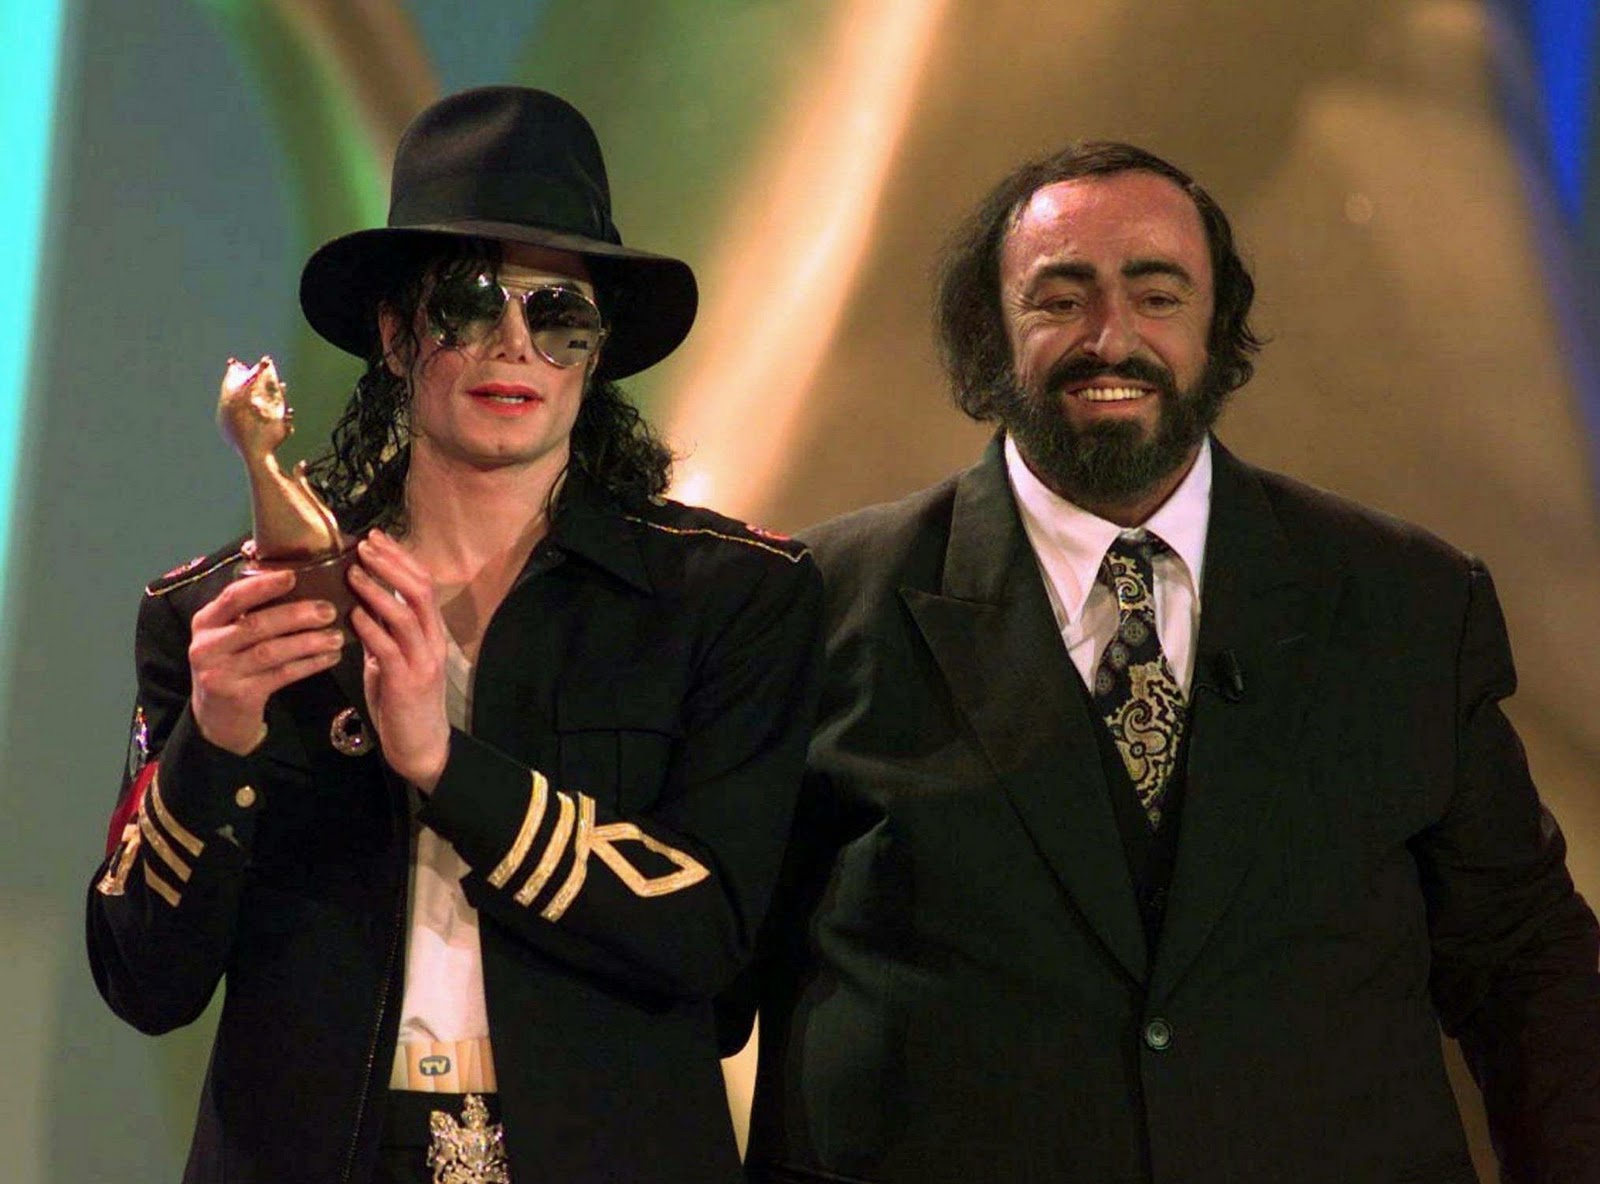 http://2.bp.blogspot.com/-VGCfmO1PQqE/Ts3K_O6LYeI/AAAAAAAADRA/zRwesALljDA/s1600/Michael-Jackson-and-Luciano-Pavarotti.jpeg